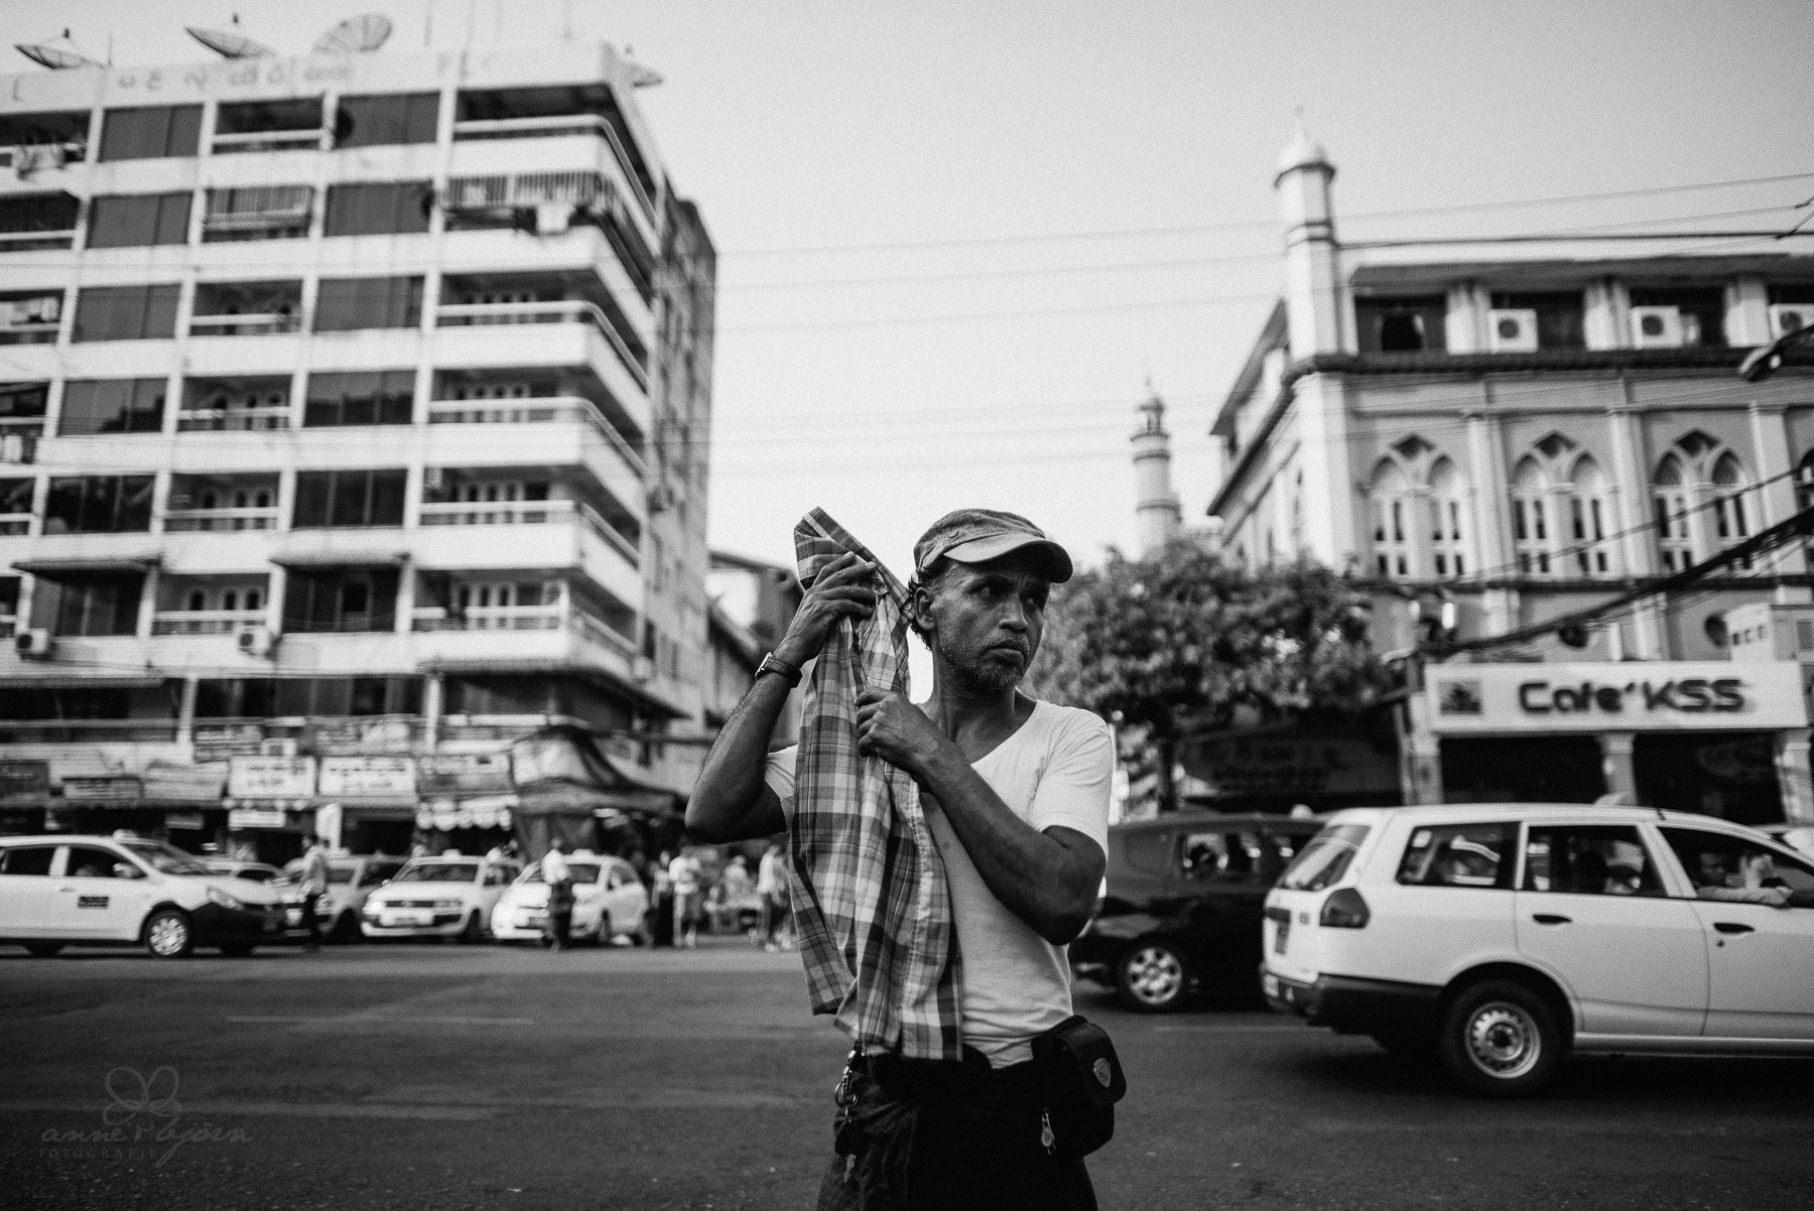 0029 yangon mandalay d76 4836 - Großstädte Myanmars - Yangon & Mandalay